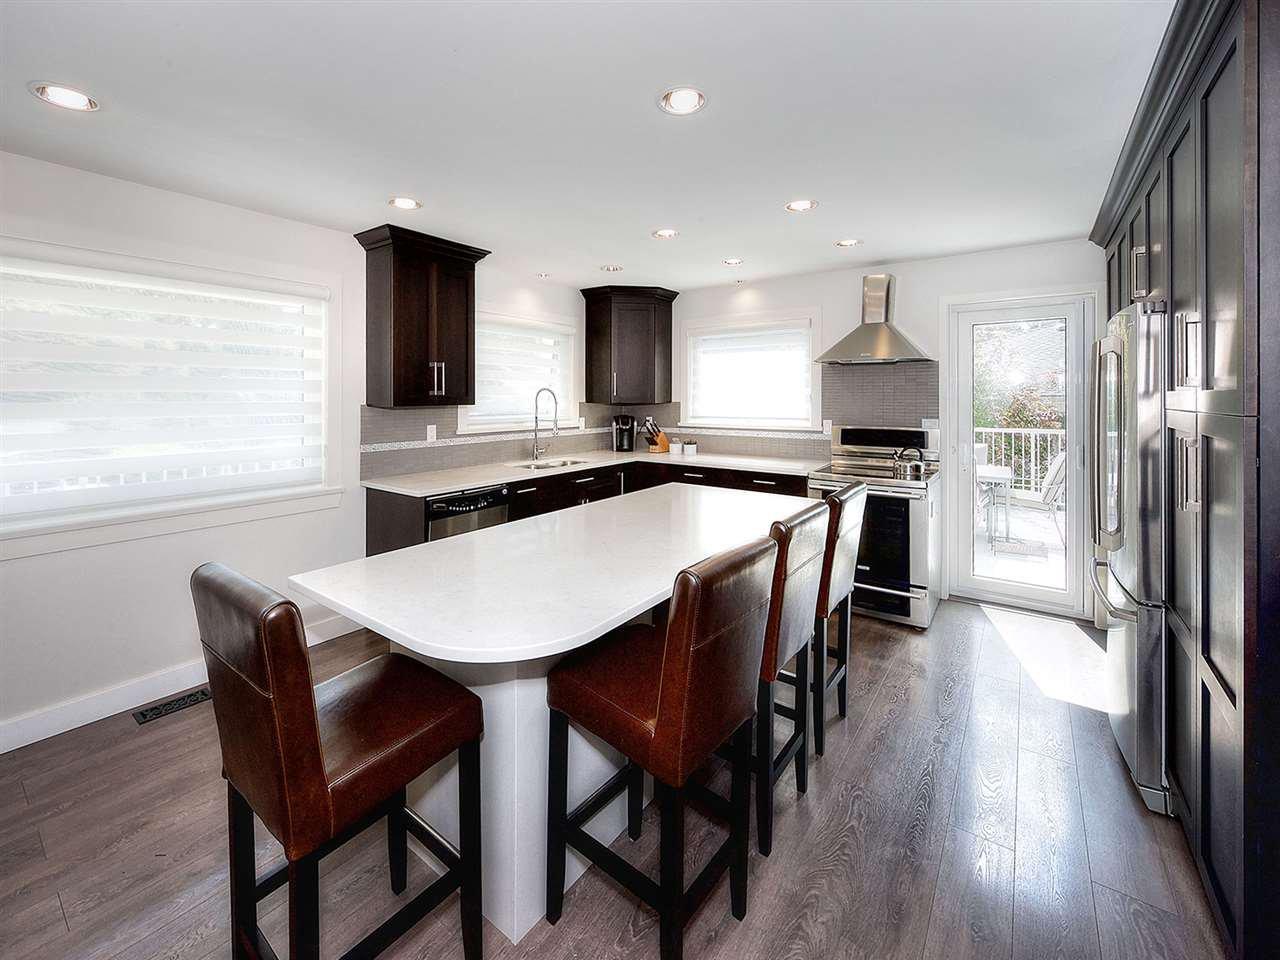 Photo 6: Photos: 1067 WILMINGTON Drive in Delta: Tsawwassen Central House for sale (Tsawwassen)  : MLS®# R2090180